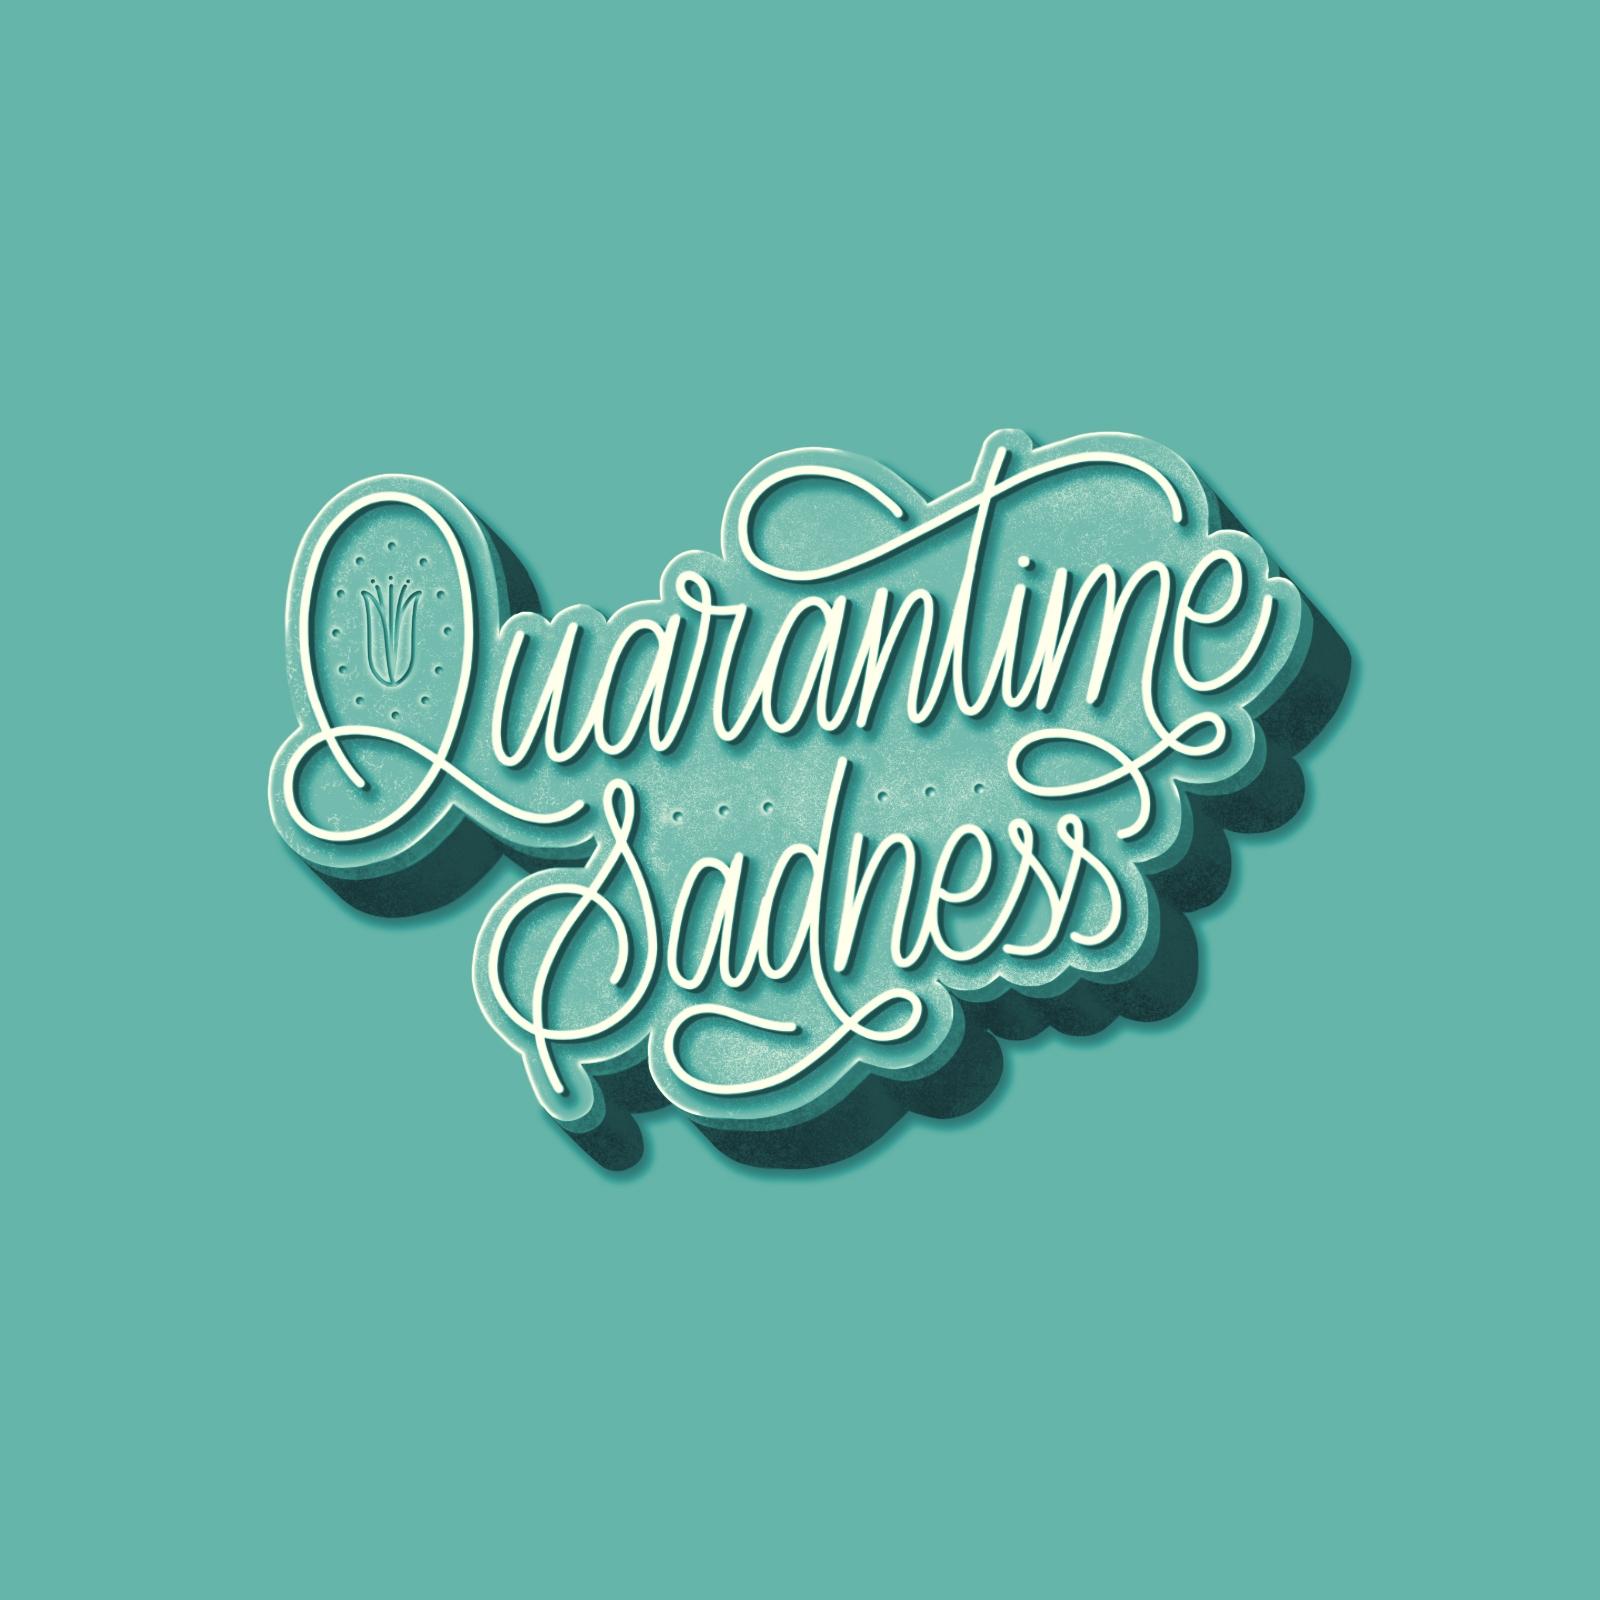 Quarantime Sadness - Julia Berezina